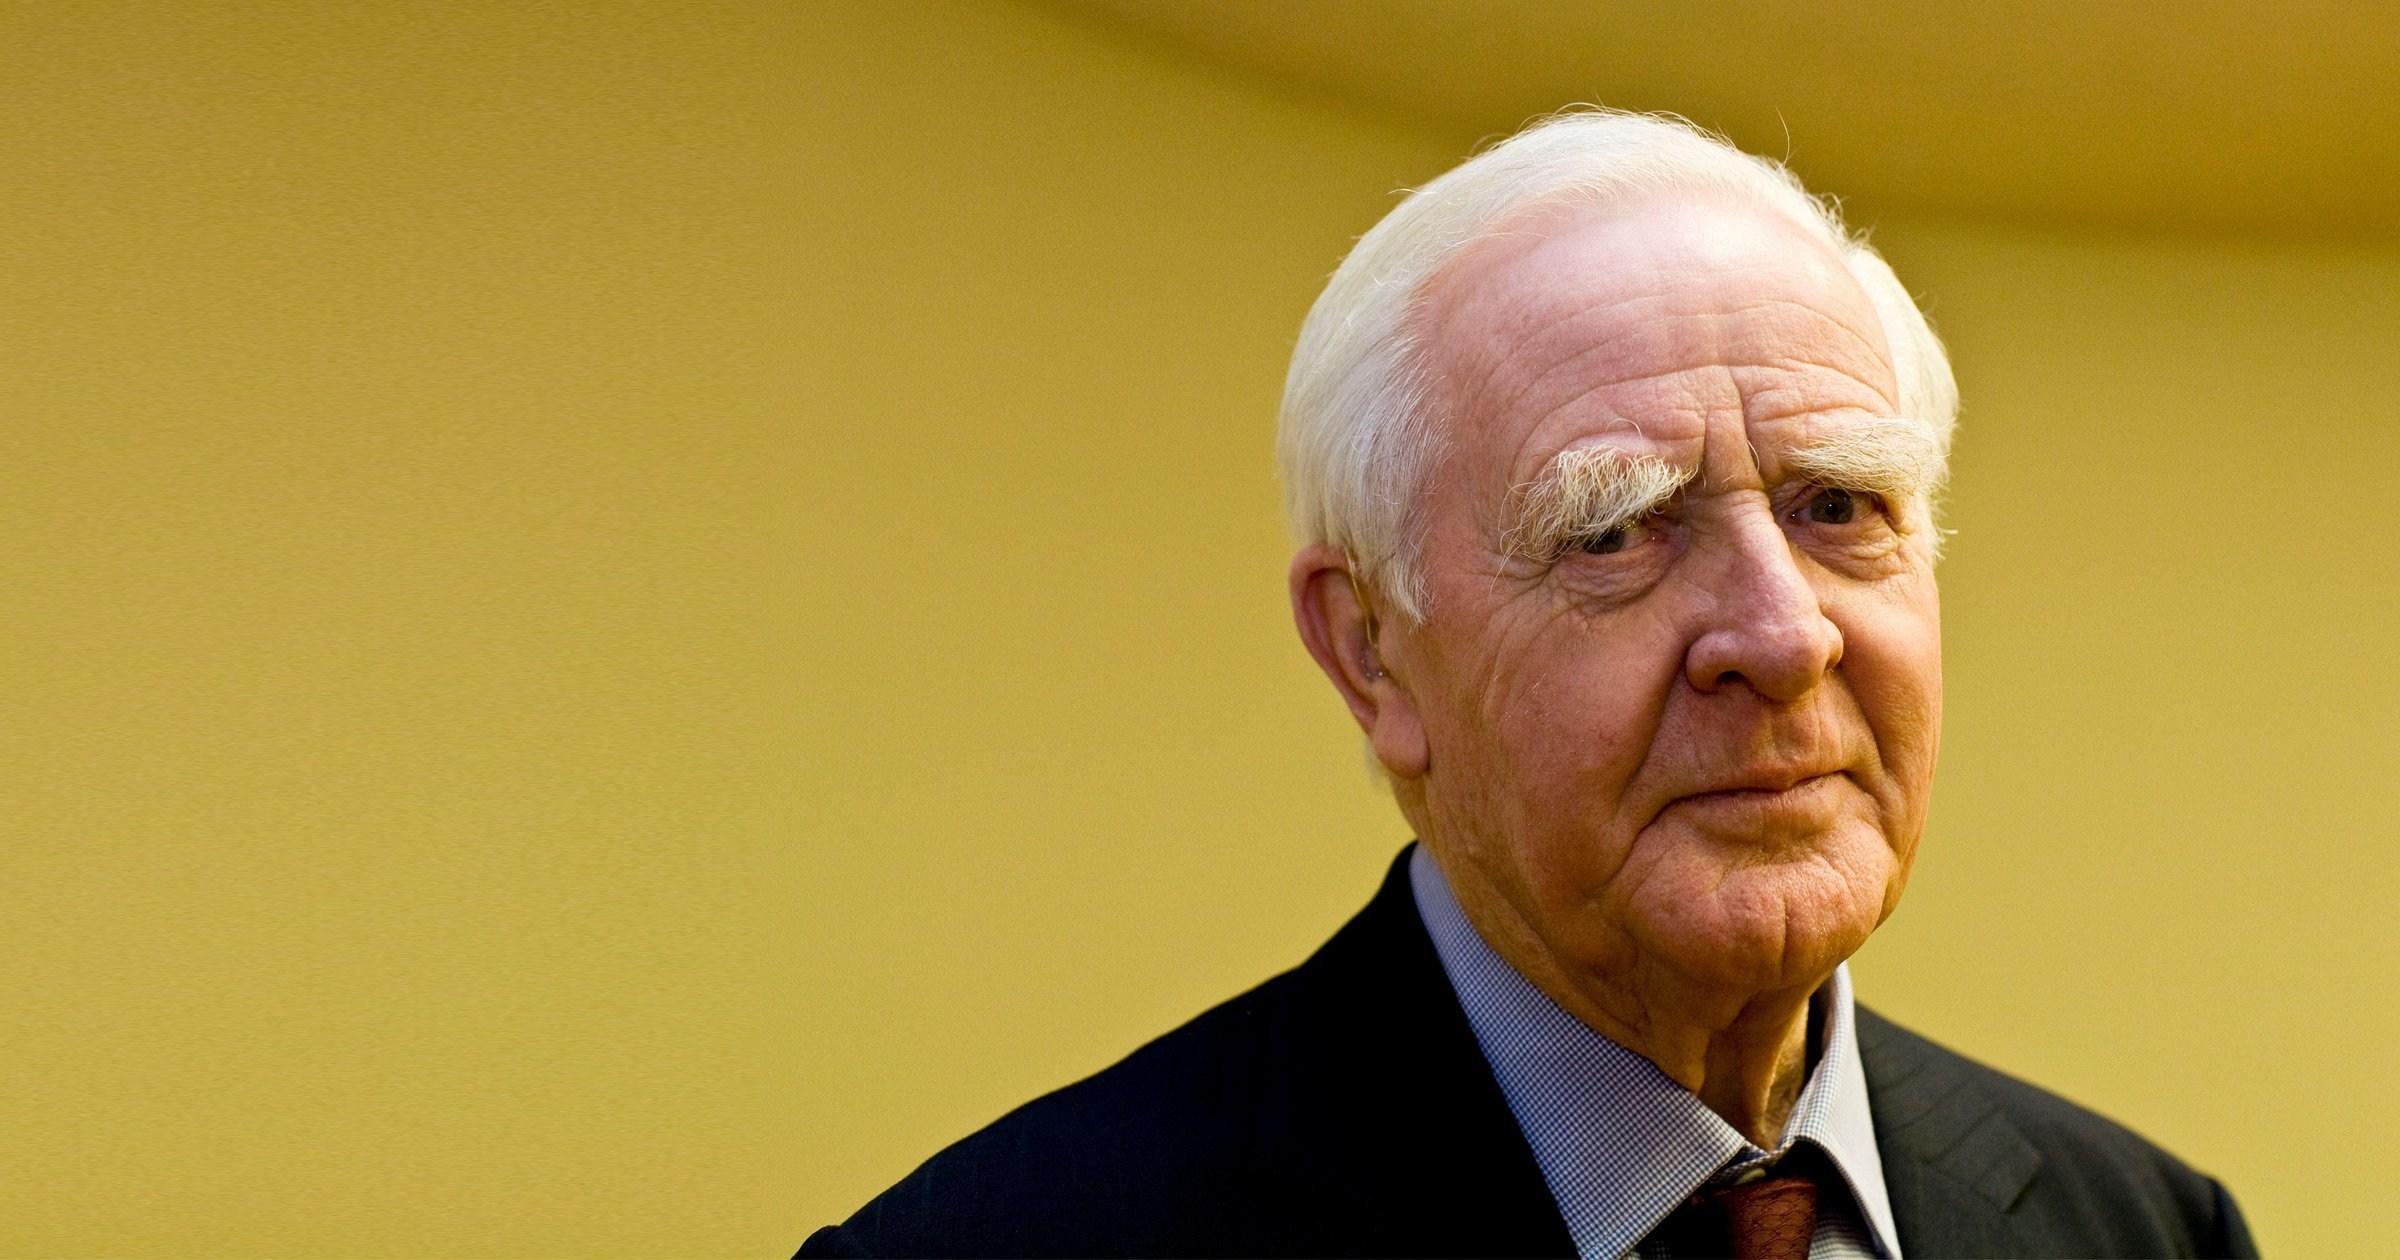 Tinker, Tailor, Soldier, Spy author John le Carré dies aged 89